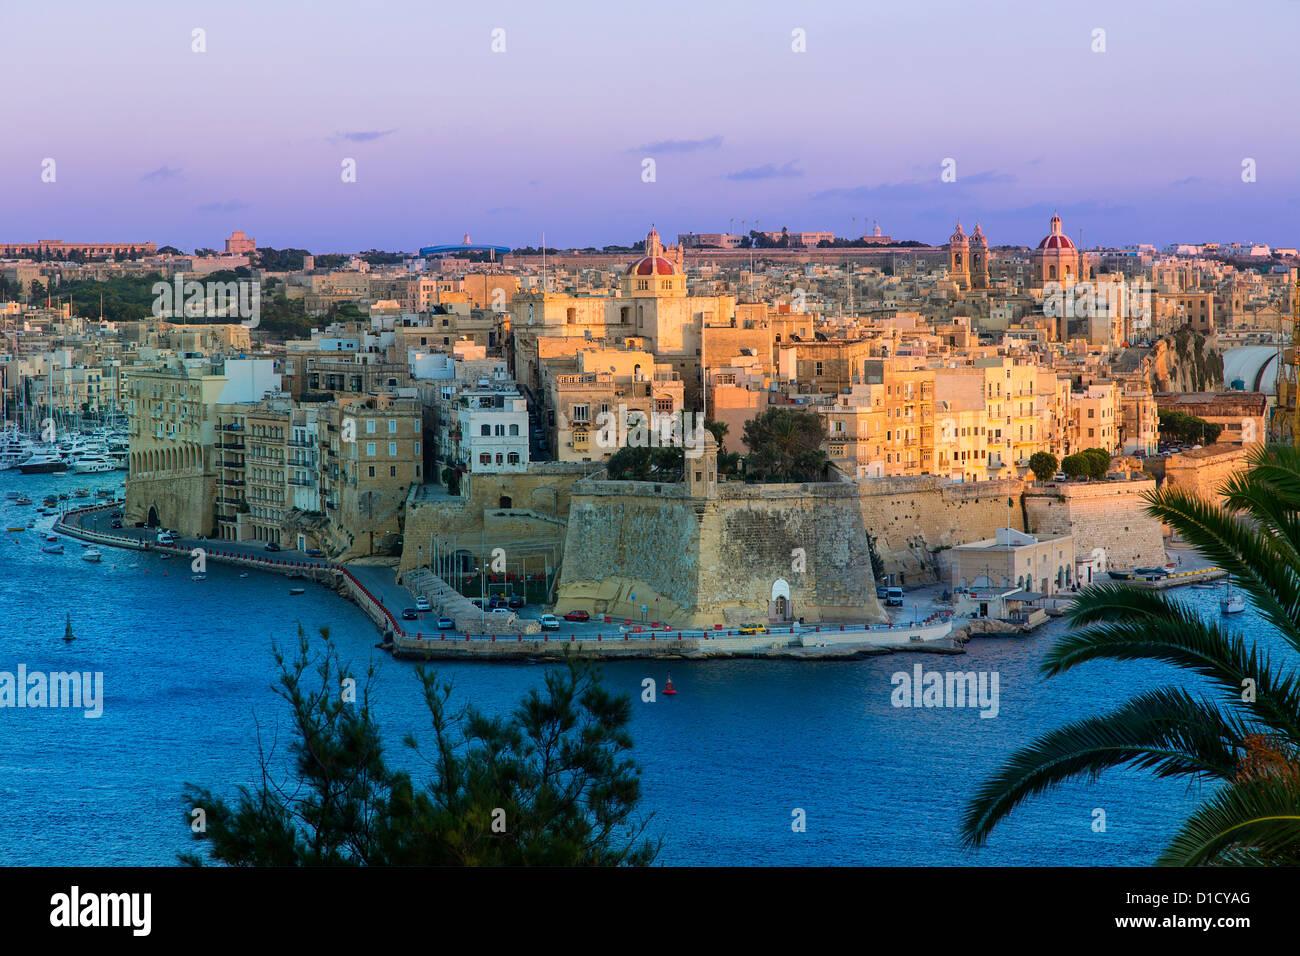 Malta, Senglea view from Valletta - Stock Image